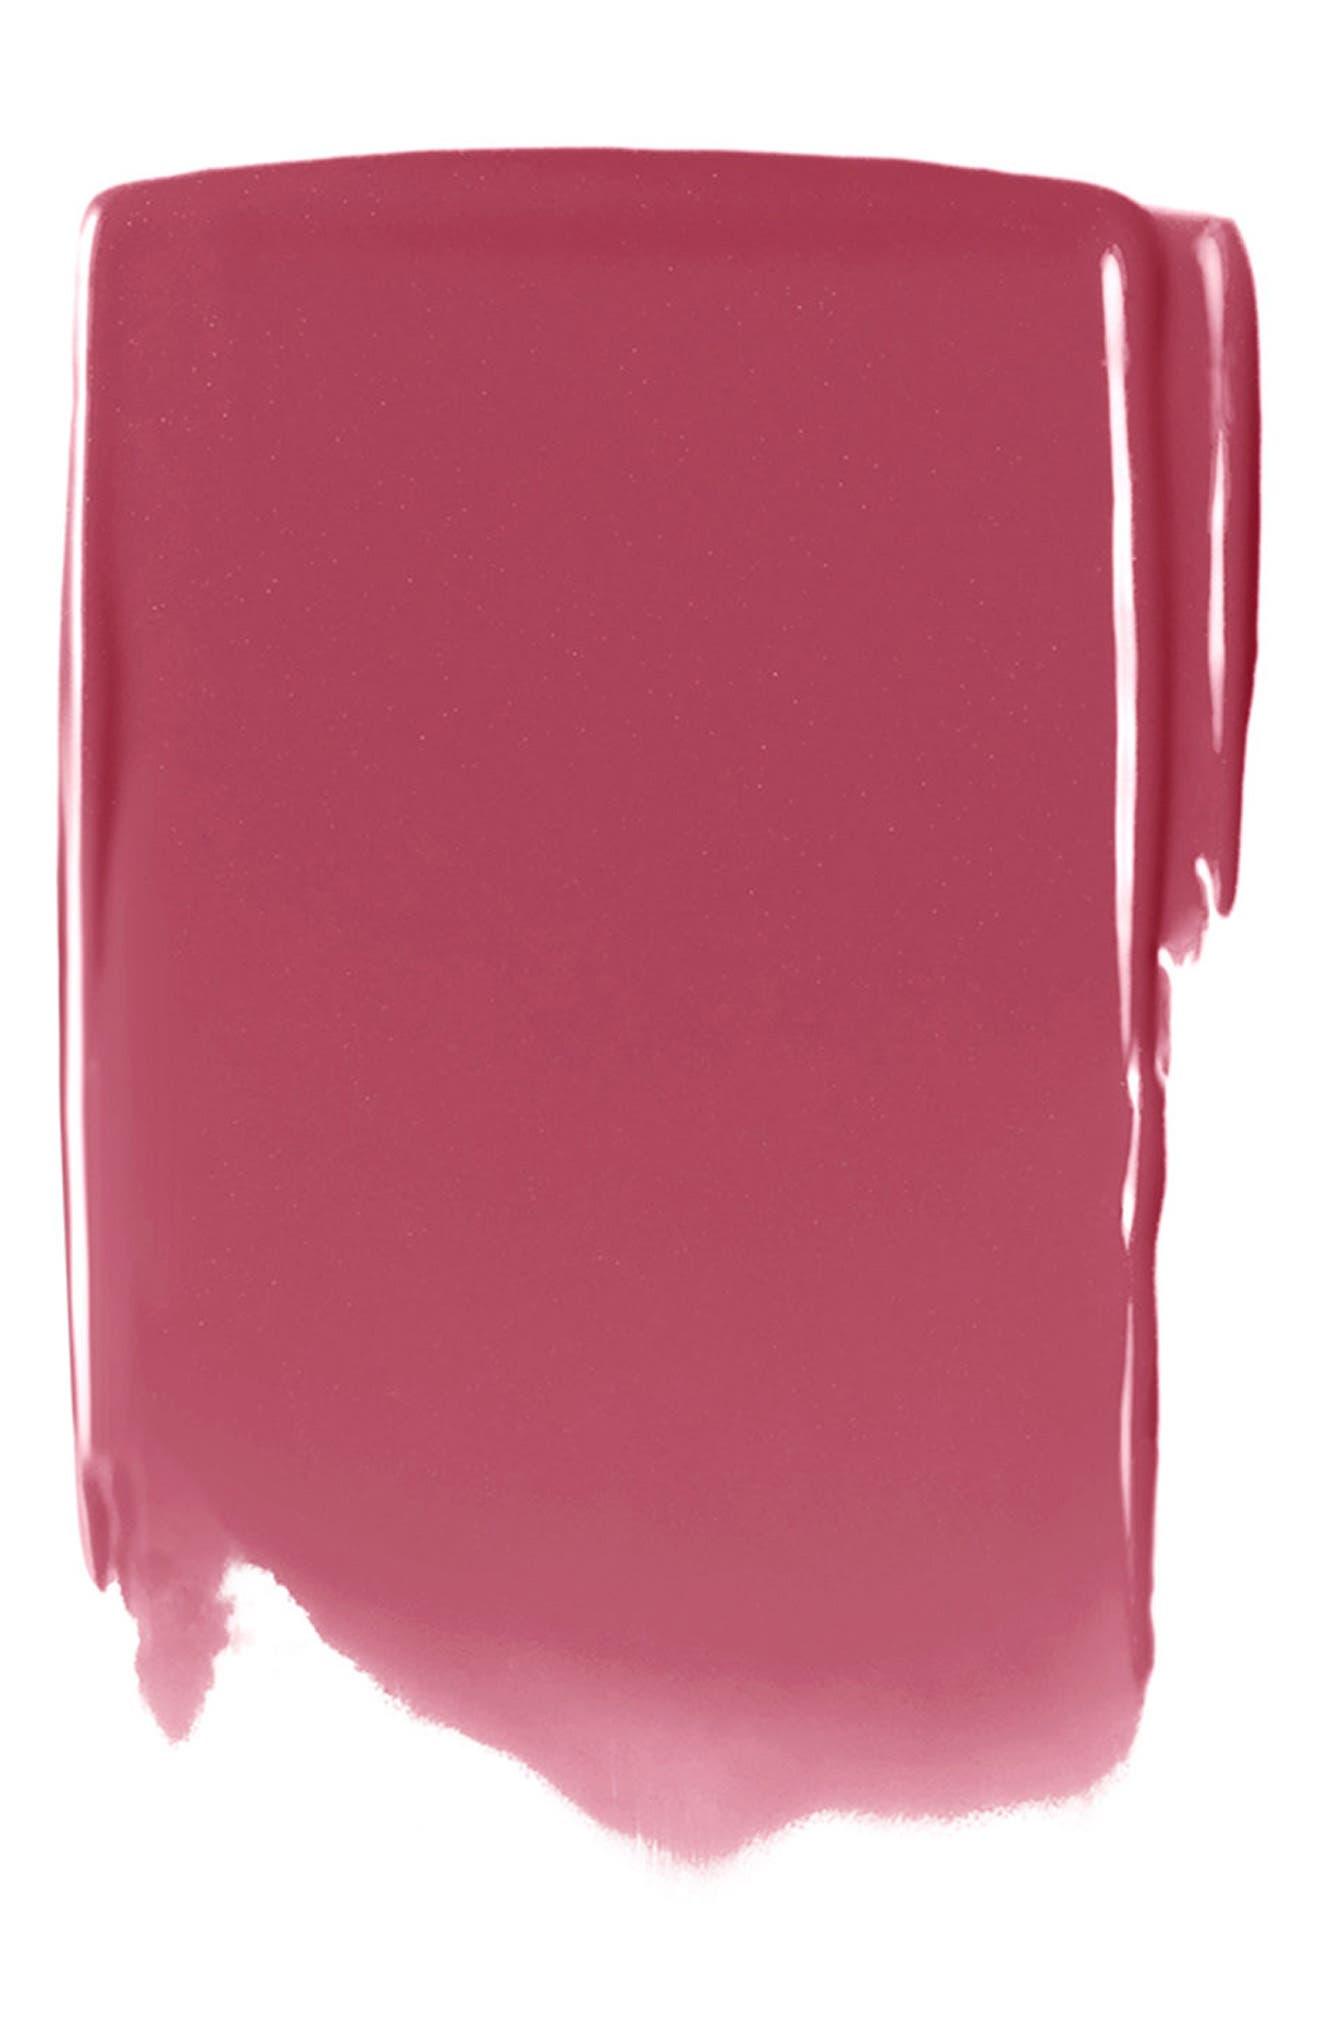 Undressed Liquid Lip Set II,                             Alternate thumbnail 8, color,                             000